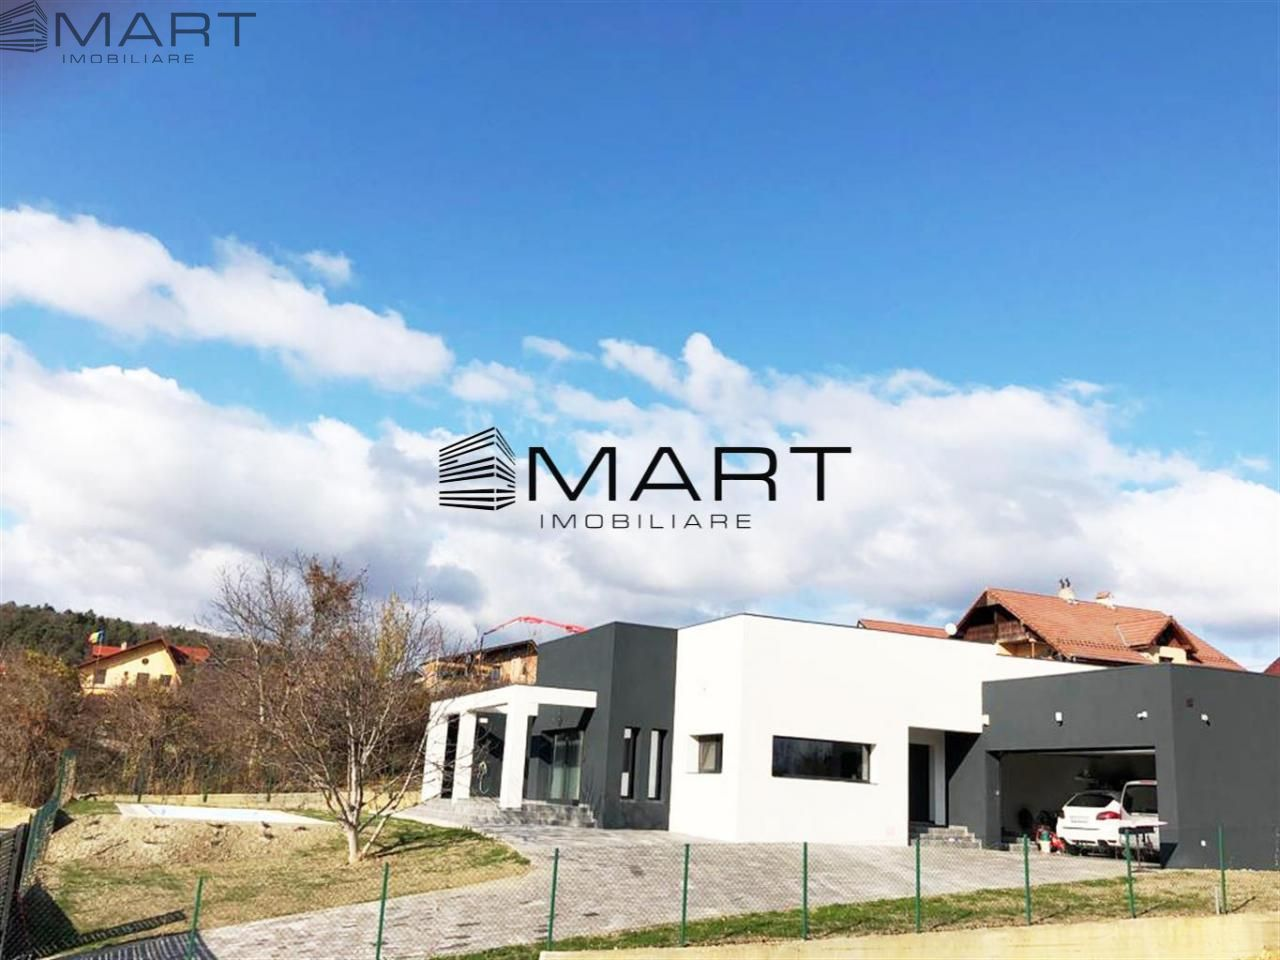 Casa de vanzare, Sibiu (judet), Cisnădioara - Foto 1